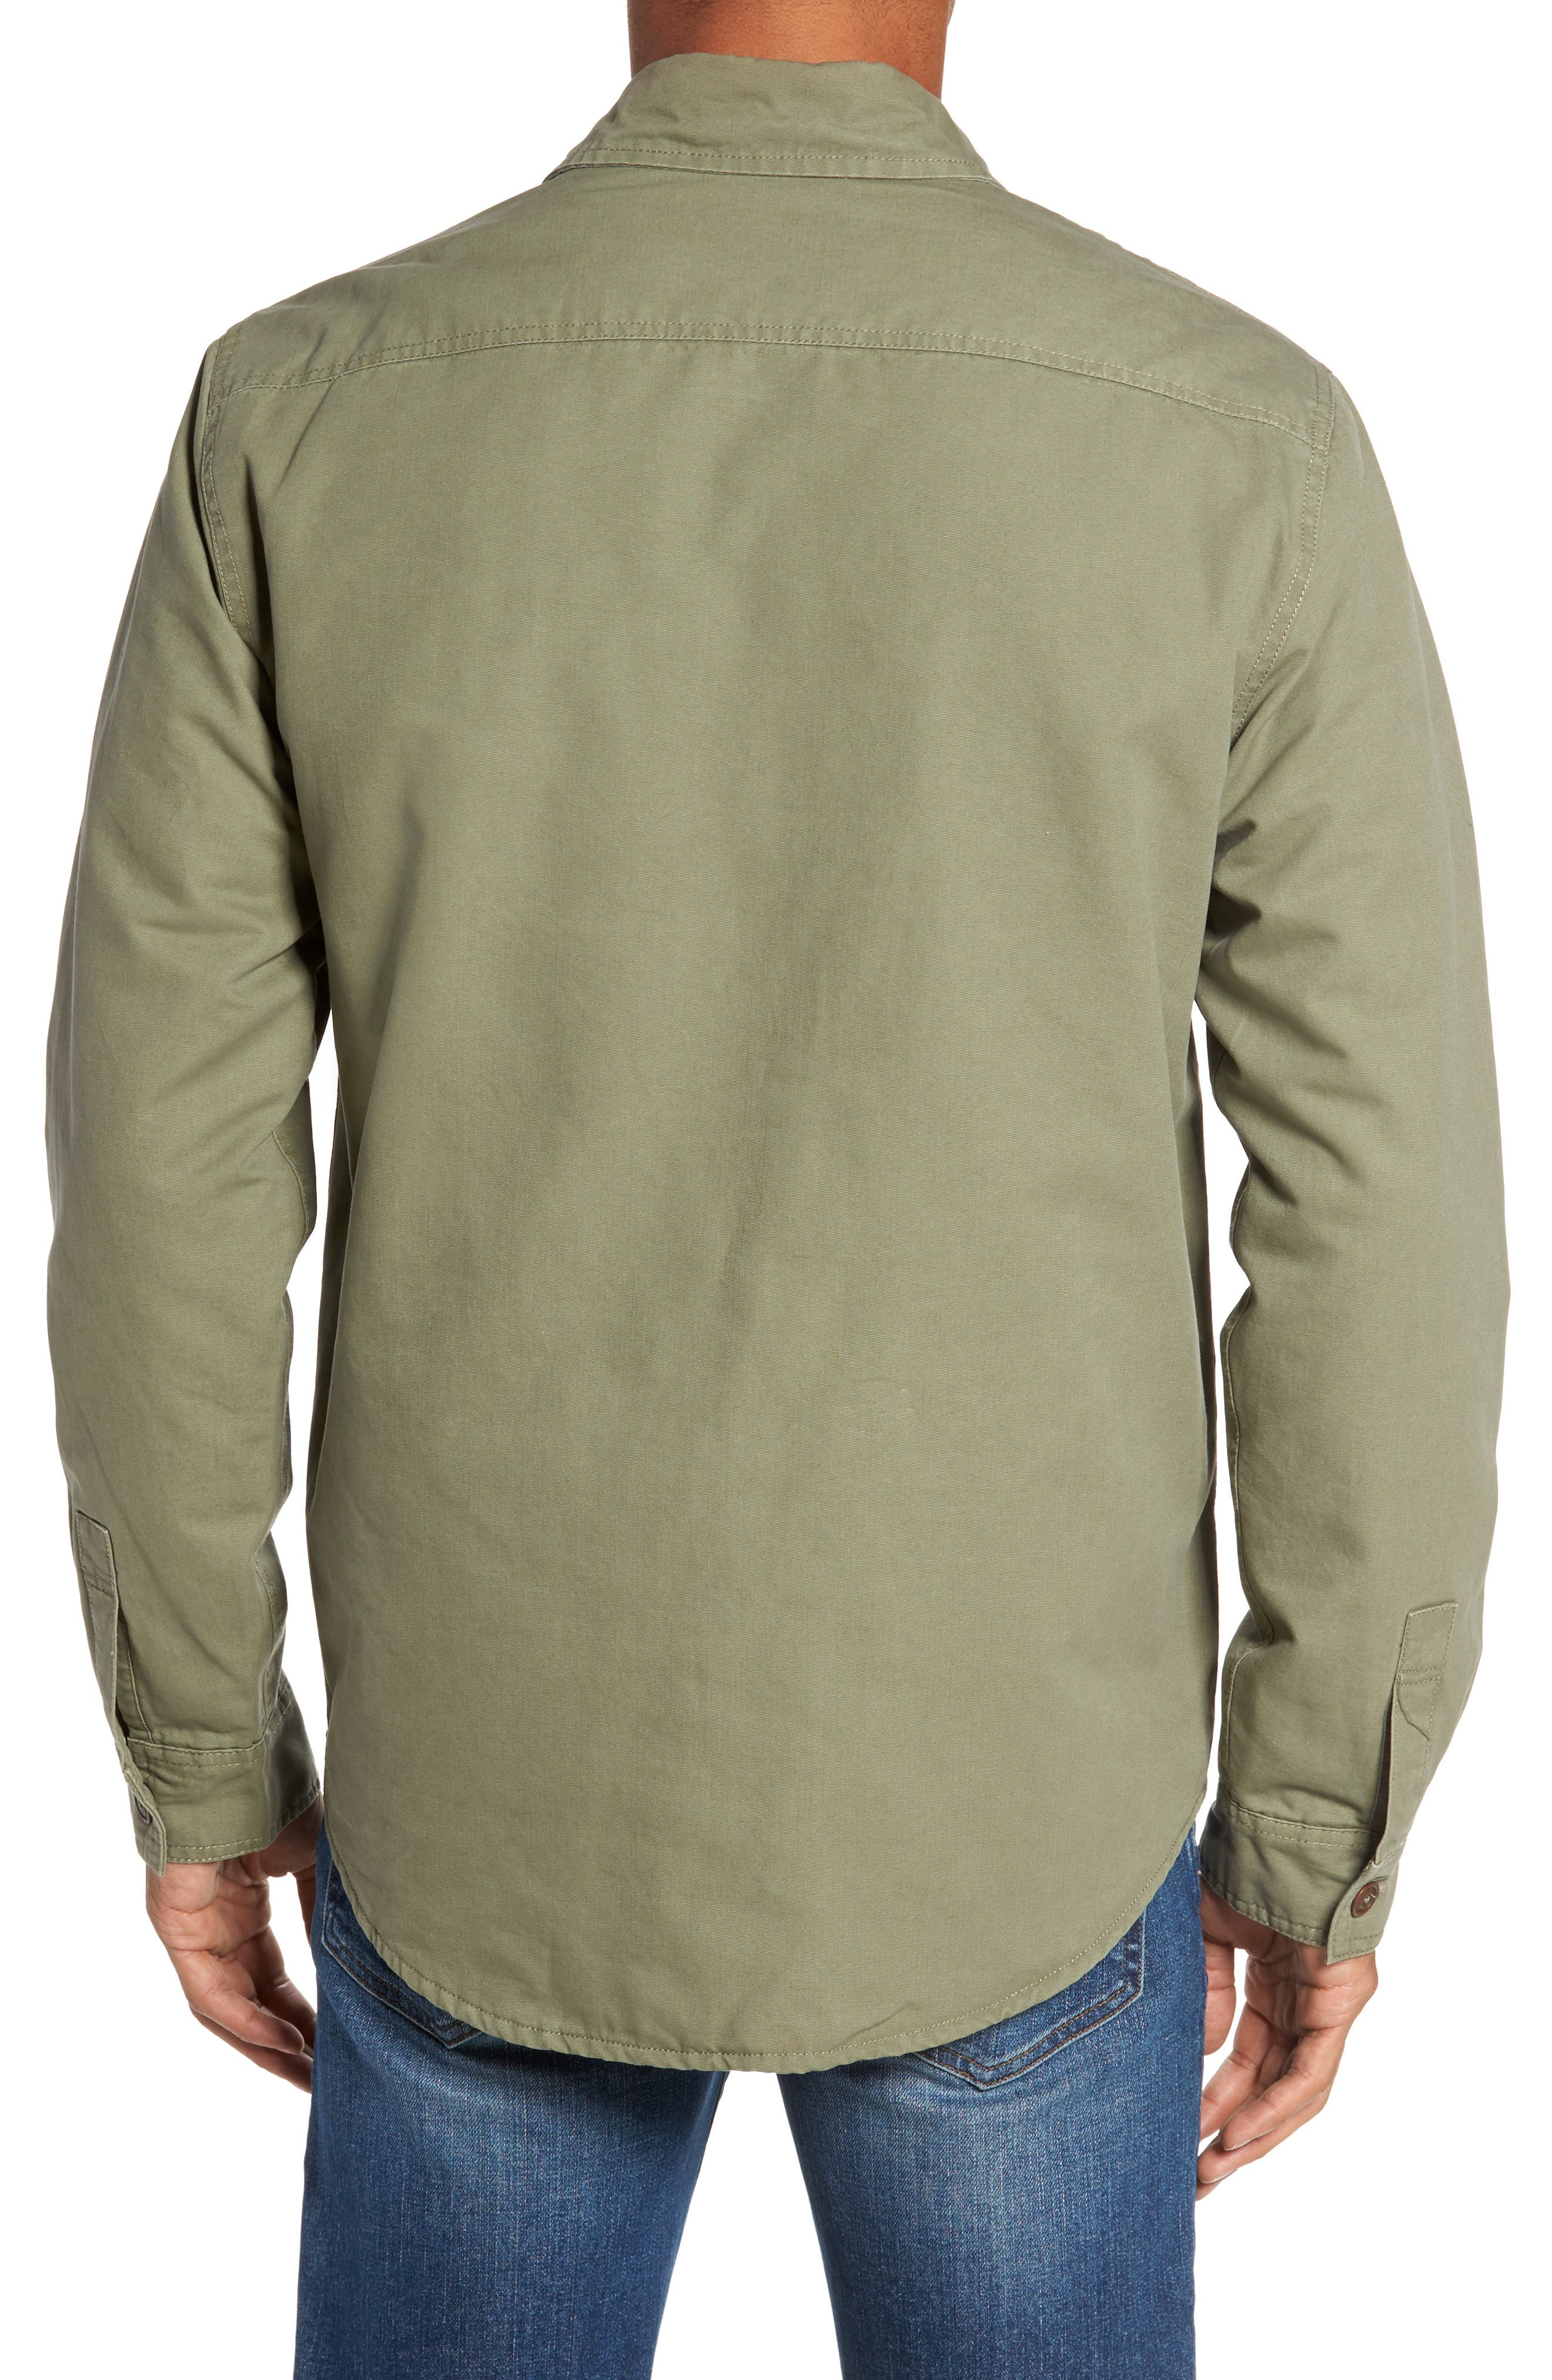 Alternate Image 2  - Faherty Blanket Lined Shirt Jacket